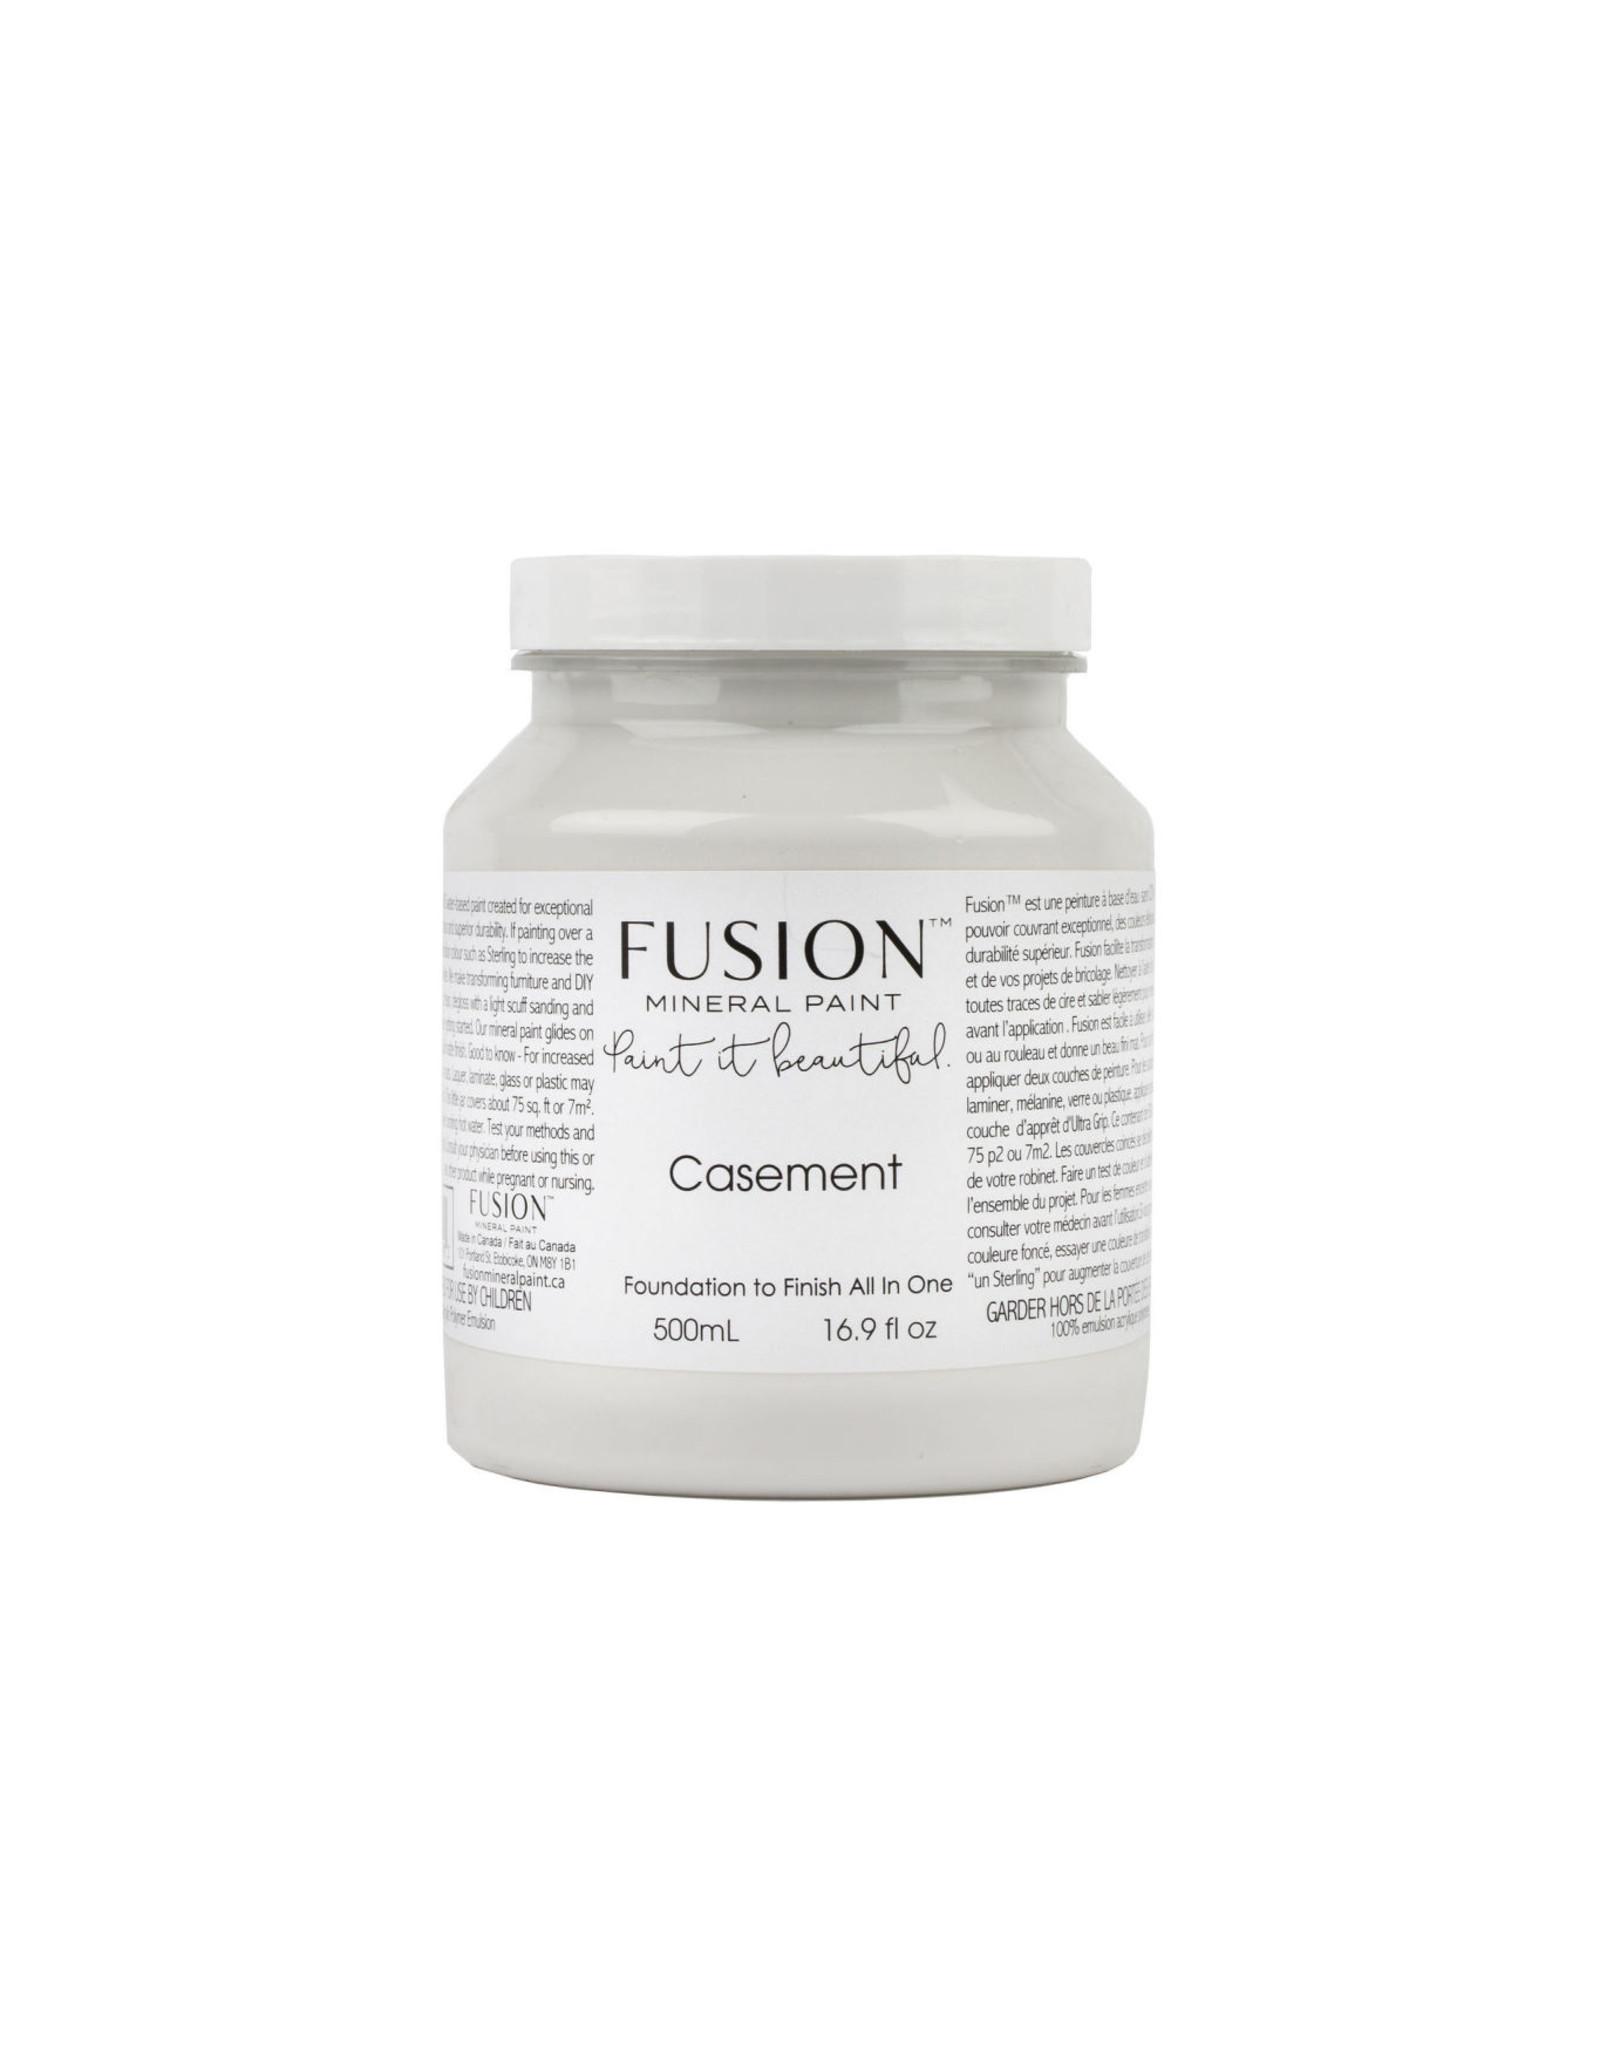 Fusion Mineral Paint Fusion Mineral Paint - Casement 500ml